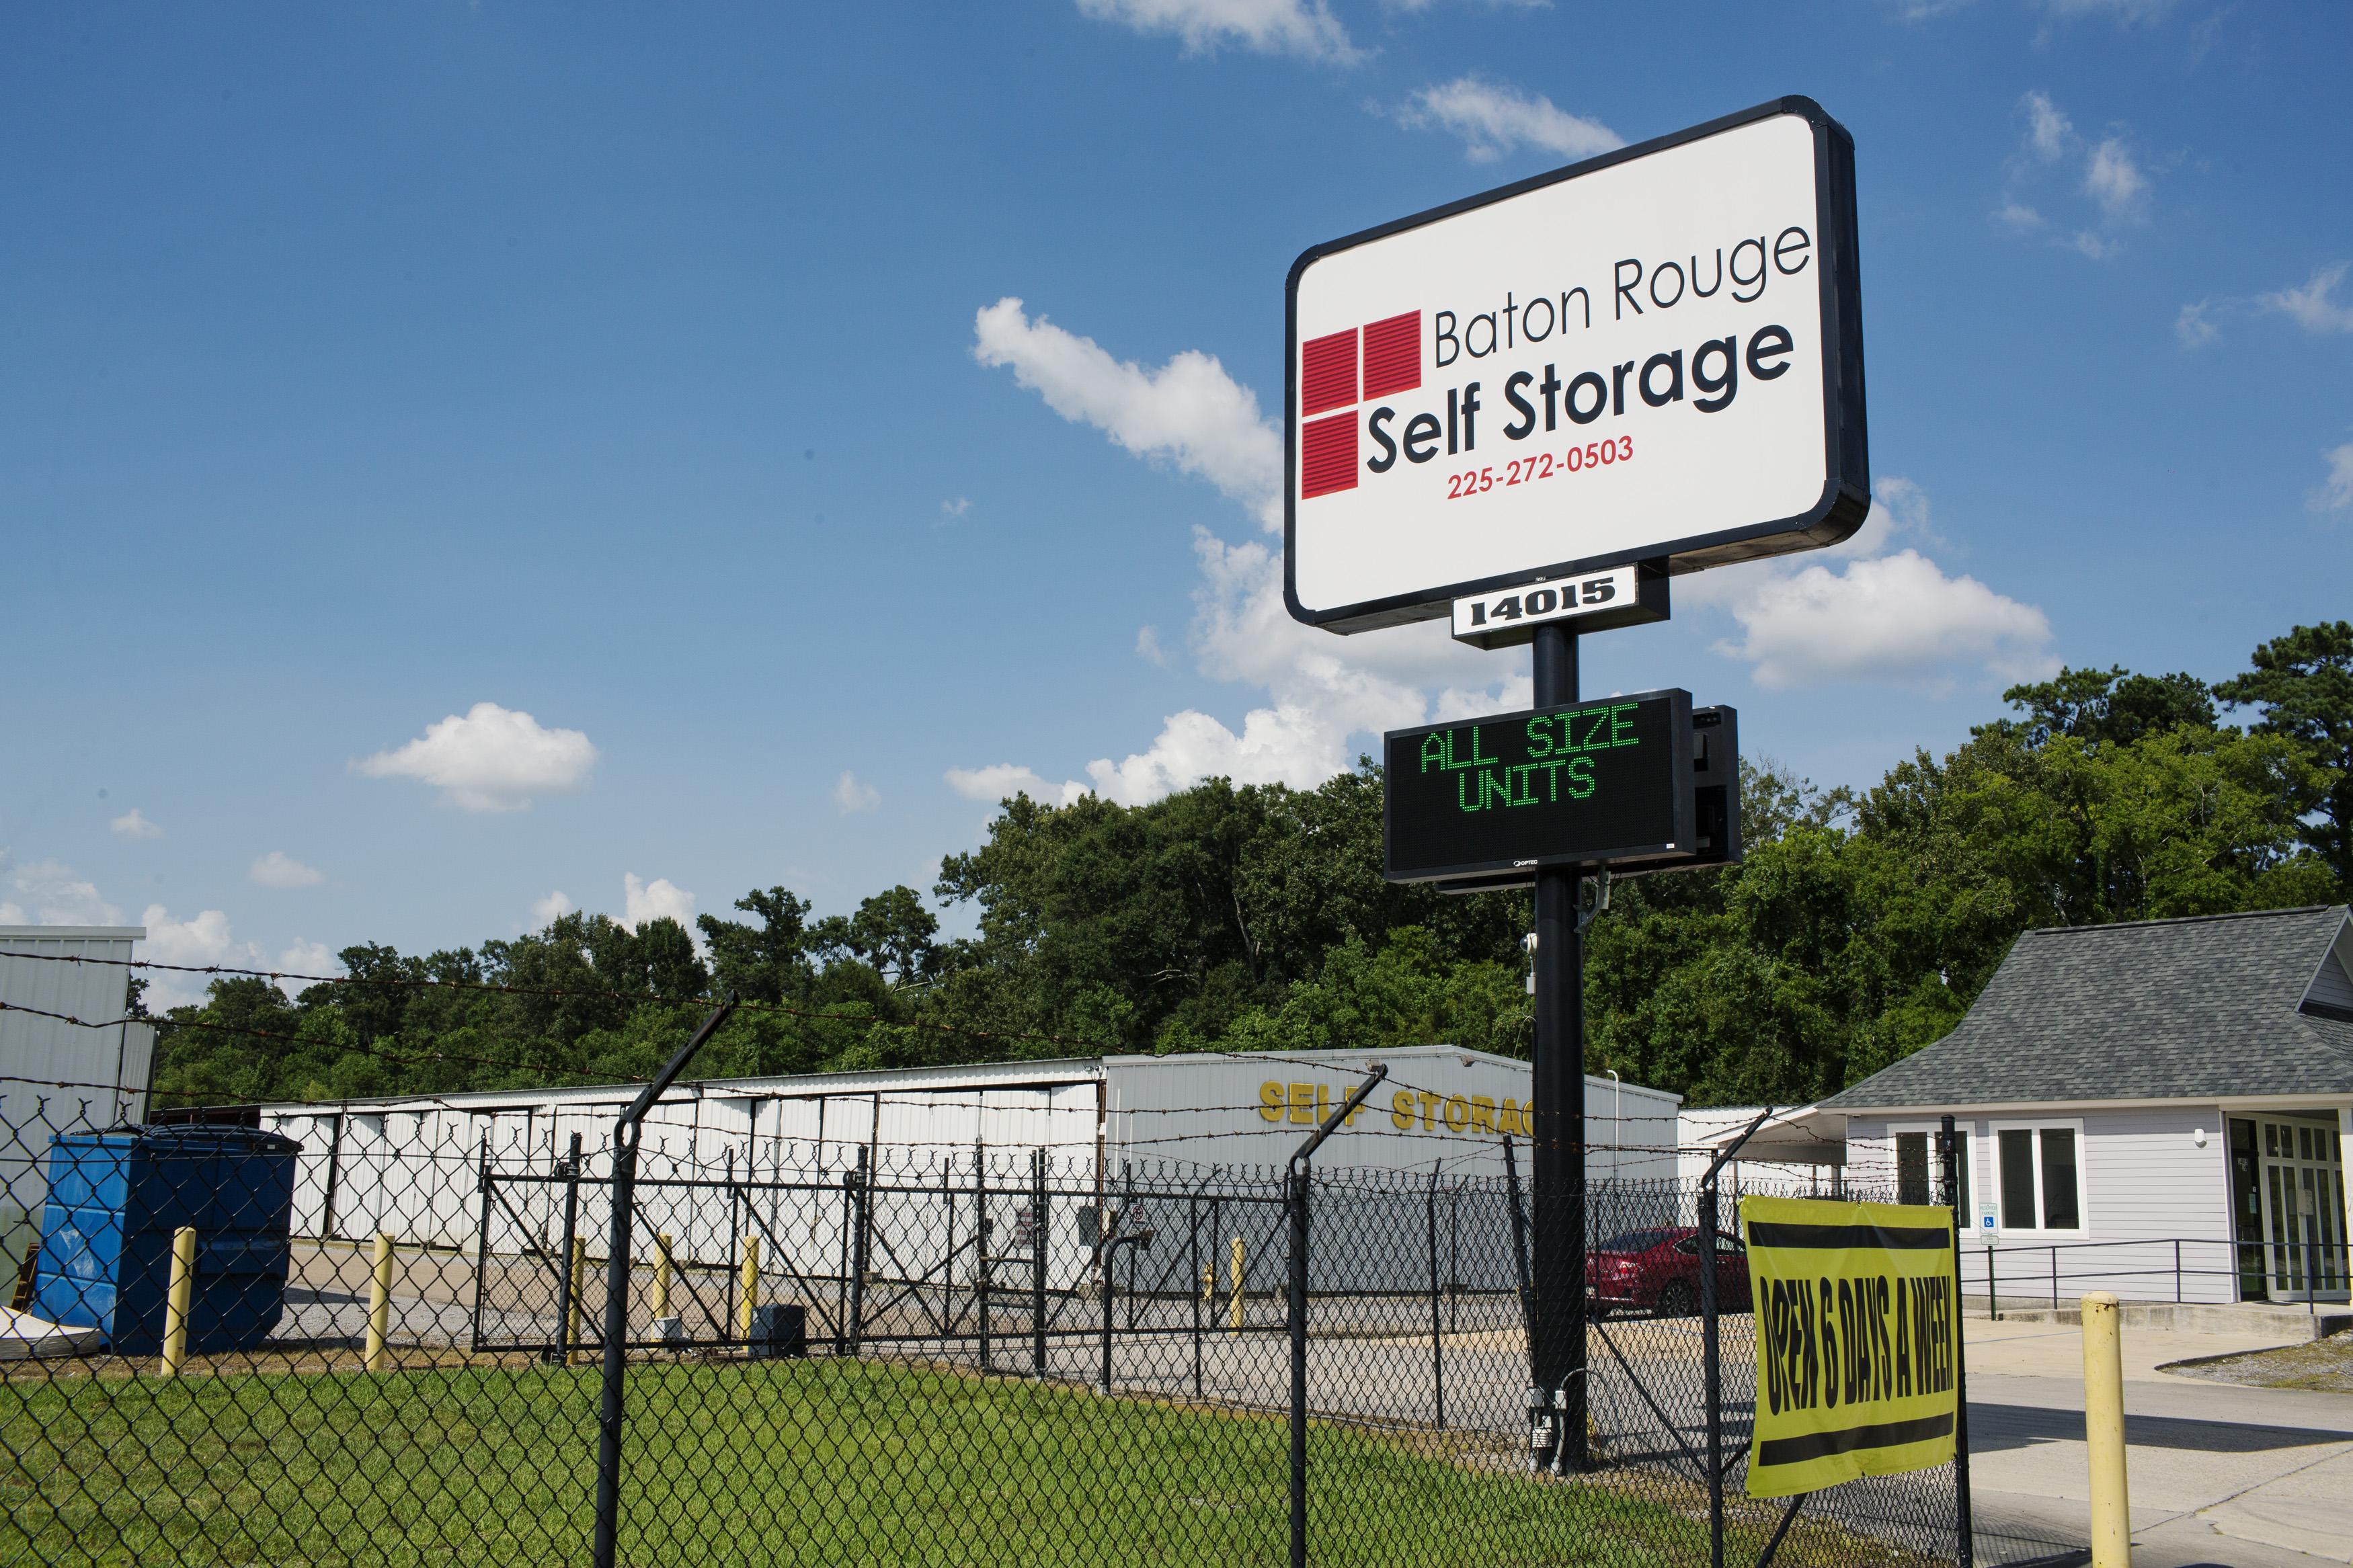 Storage units in Baton Rouge, LA